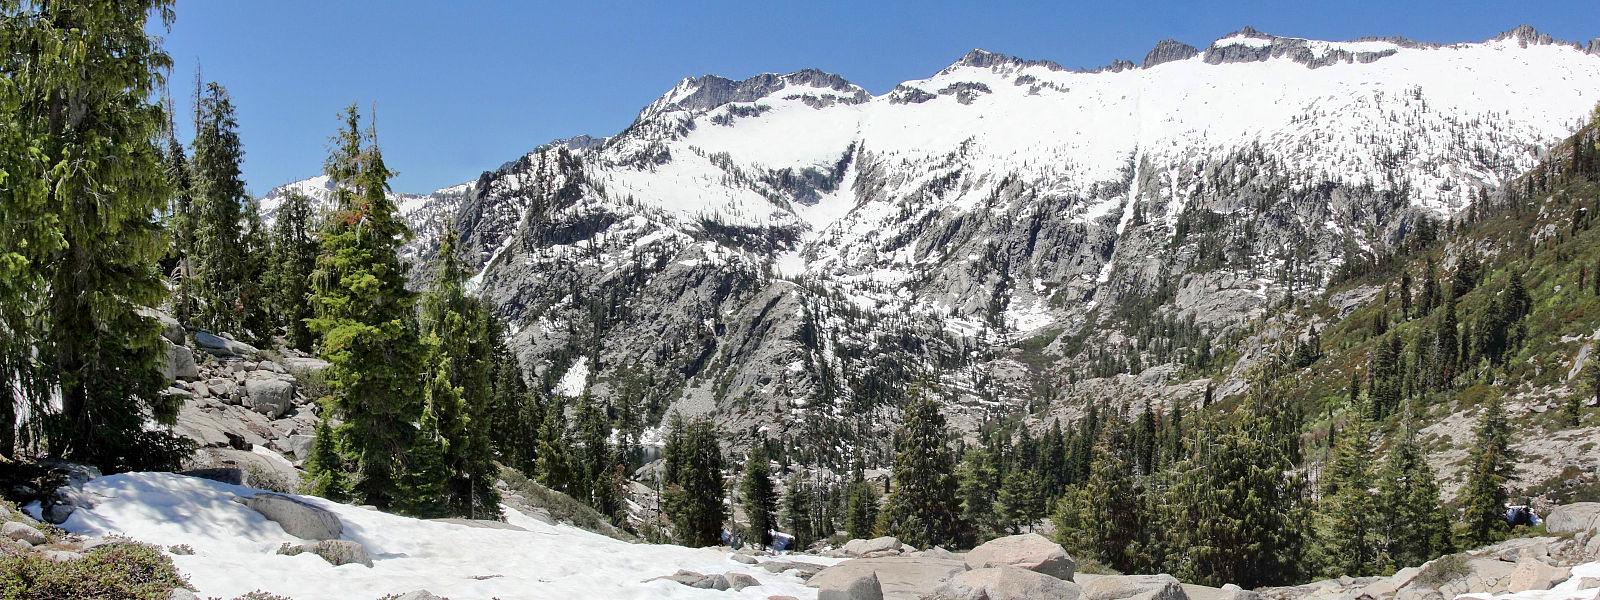 Lower_Canyon_Lake_Trail,_Trinity_Alps.jpg